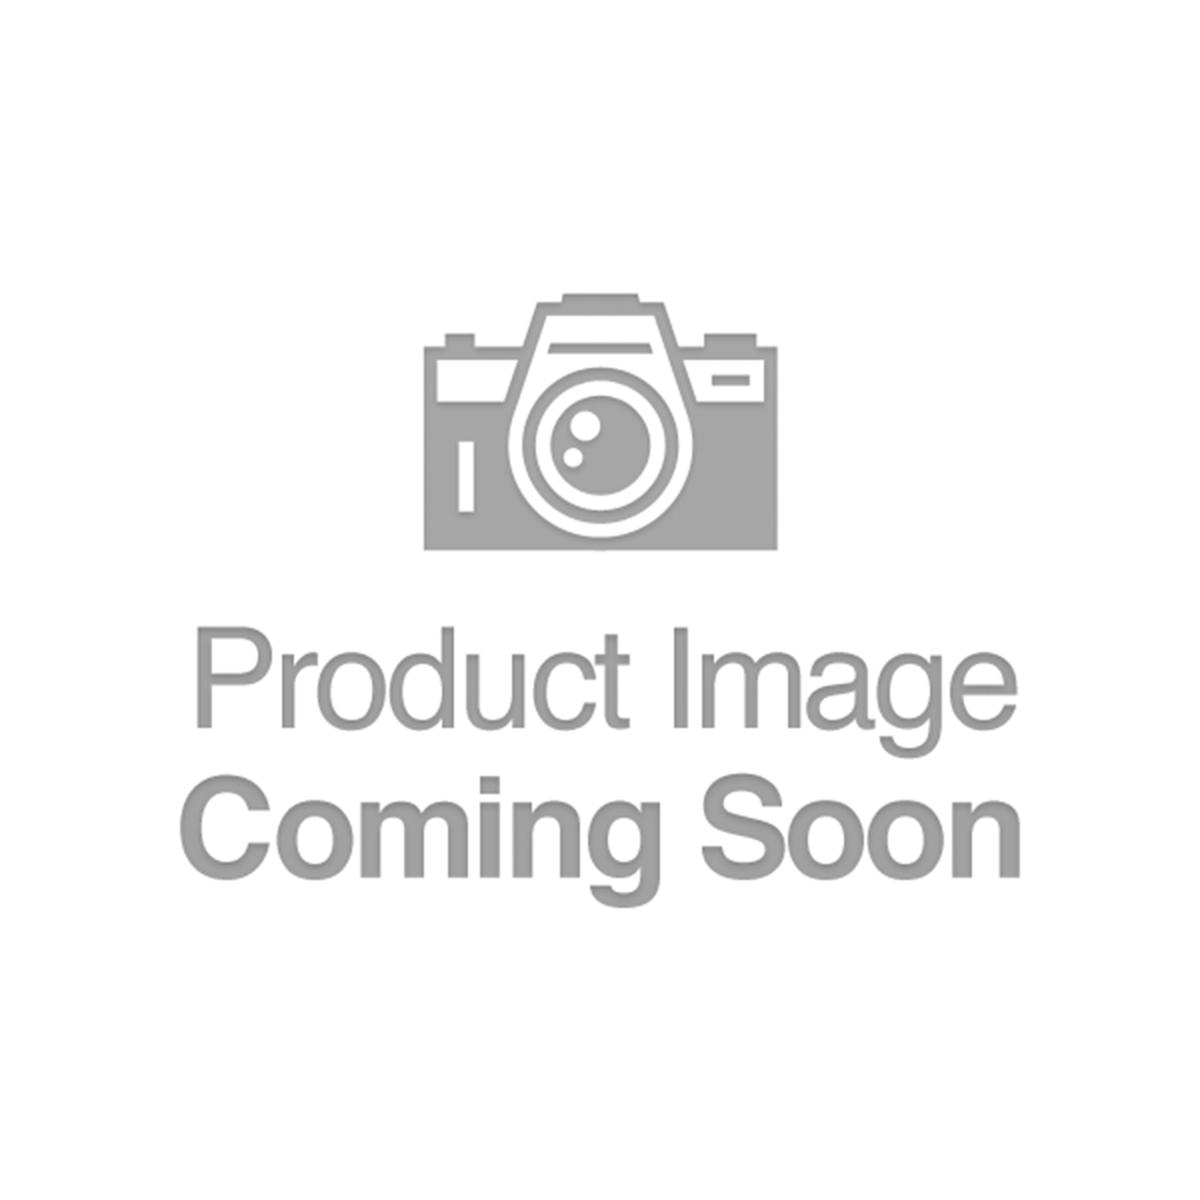 Albert Lea – Minnesota – CH 3560 – FR 496 – Fine